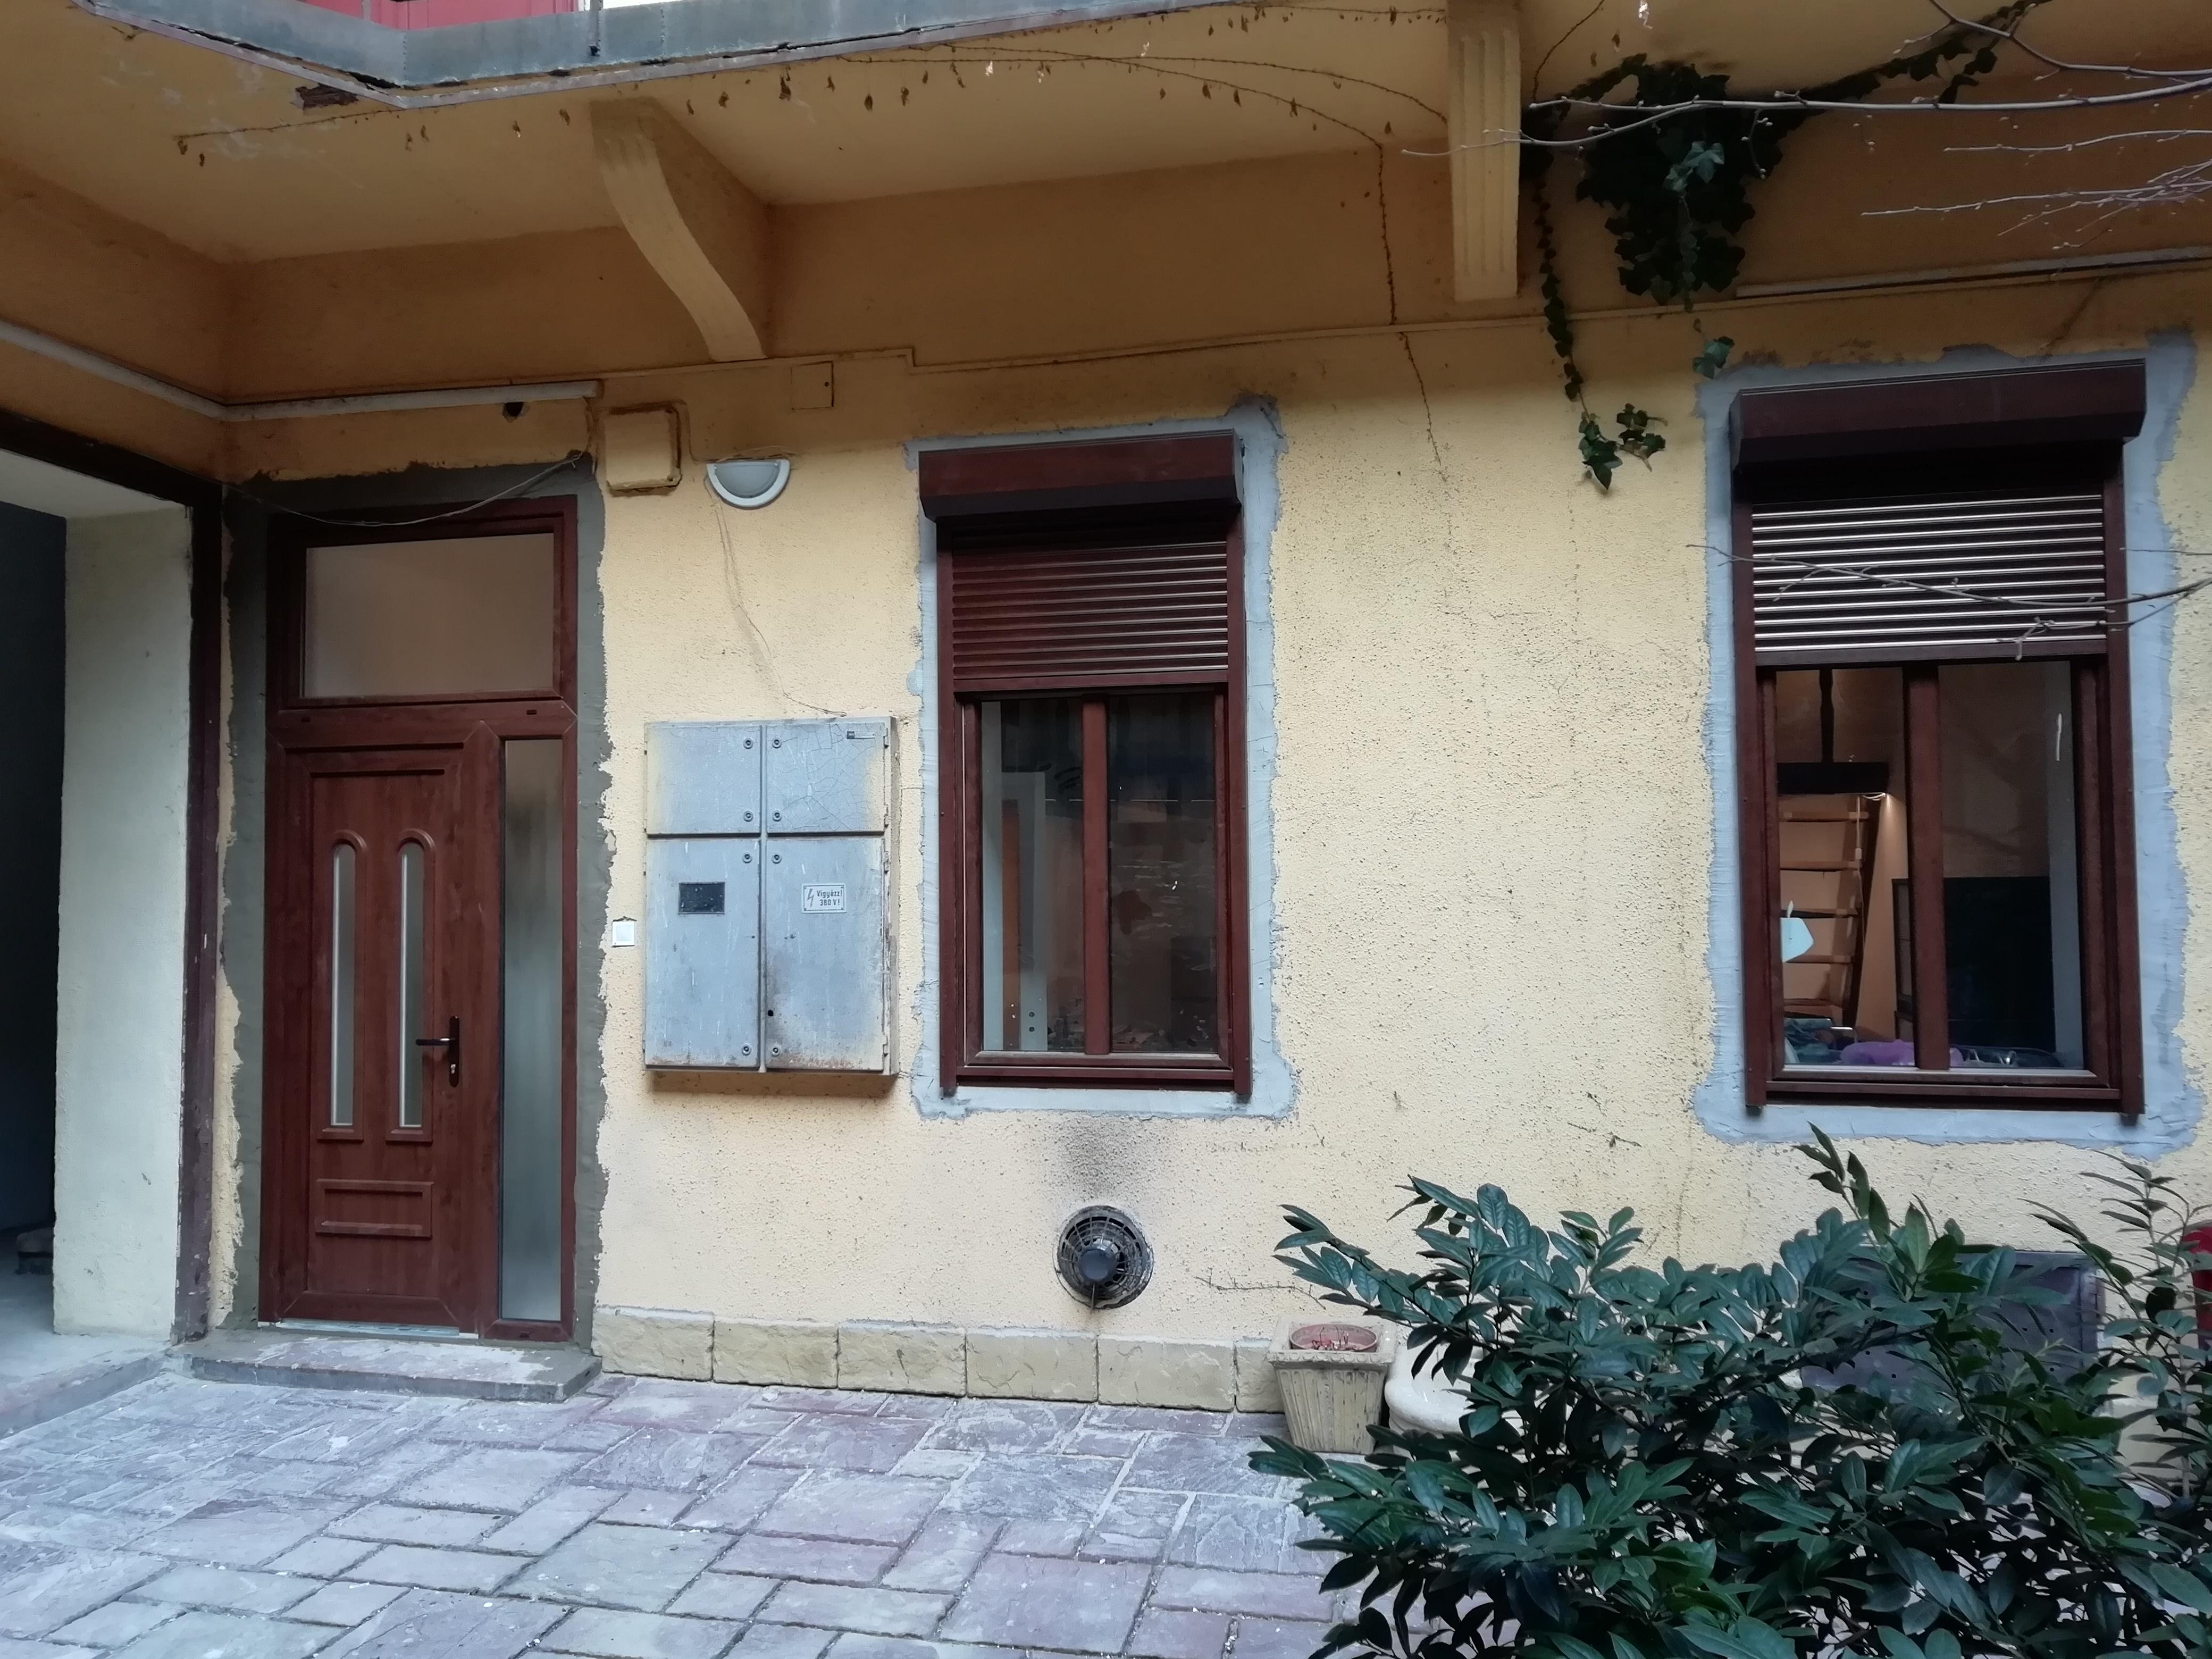 bejarati-ajto-ablak-beepites-4